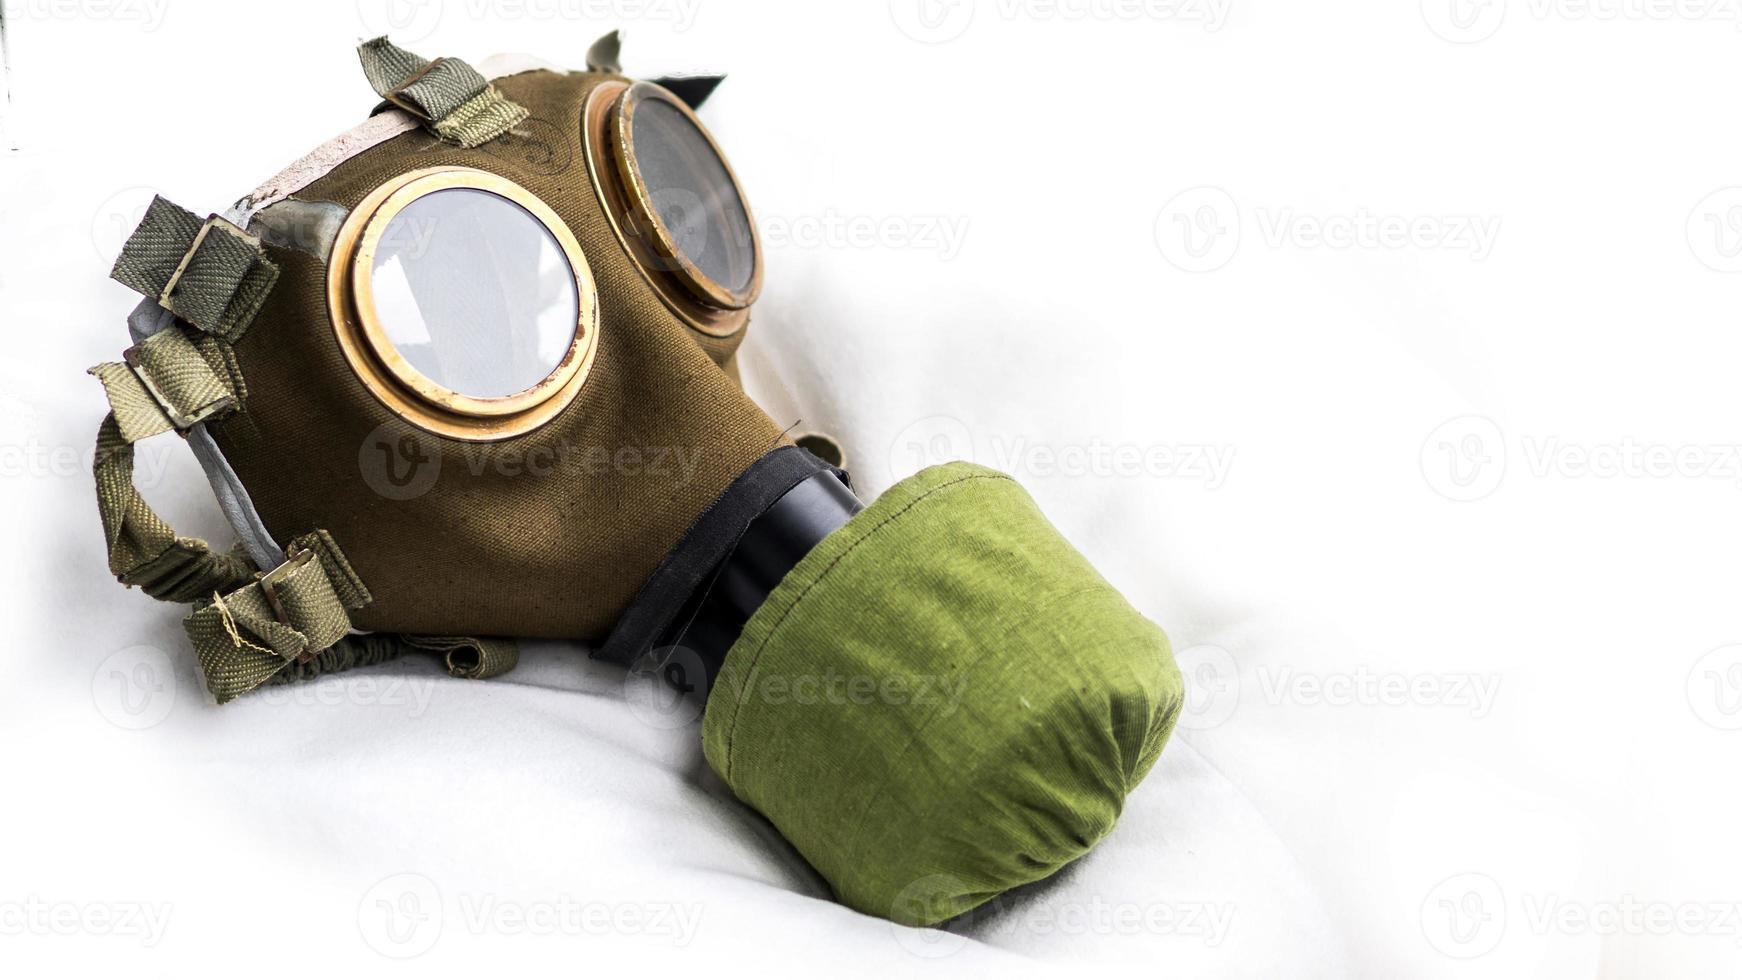 hongaars m76 gasmasker met nbc filter foto